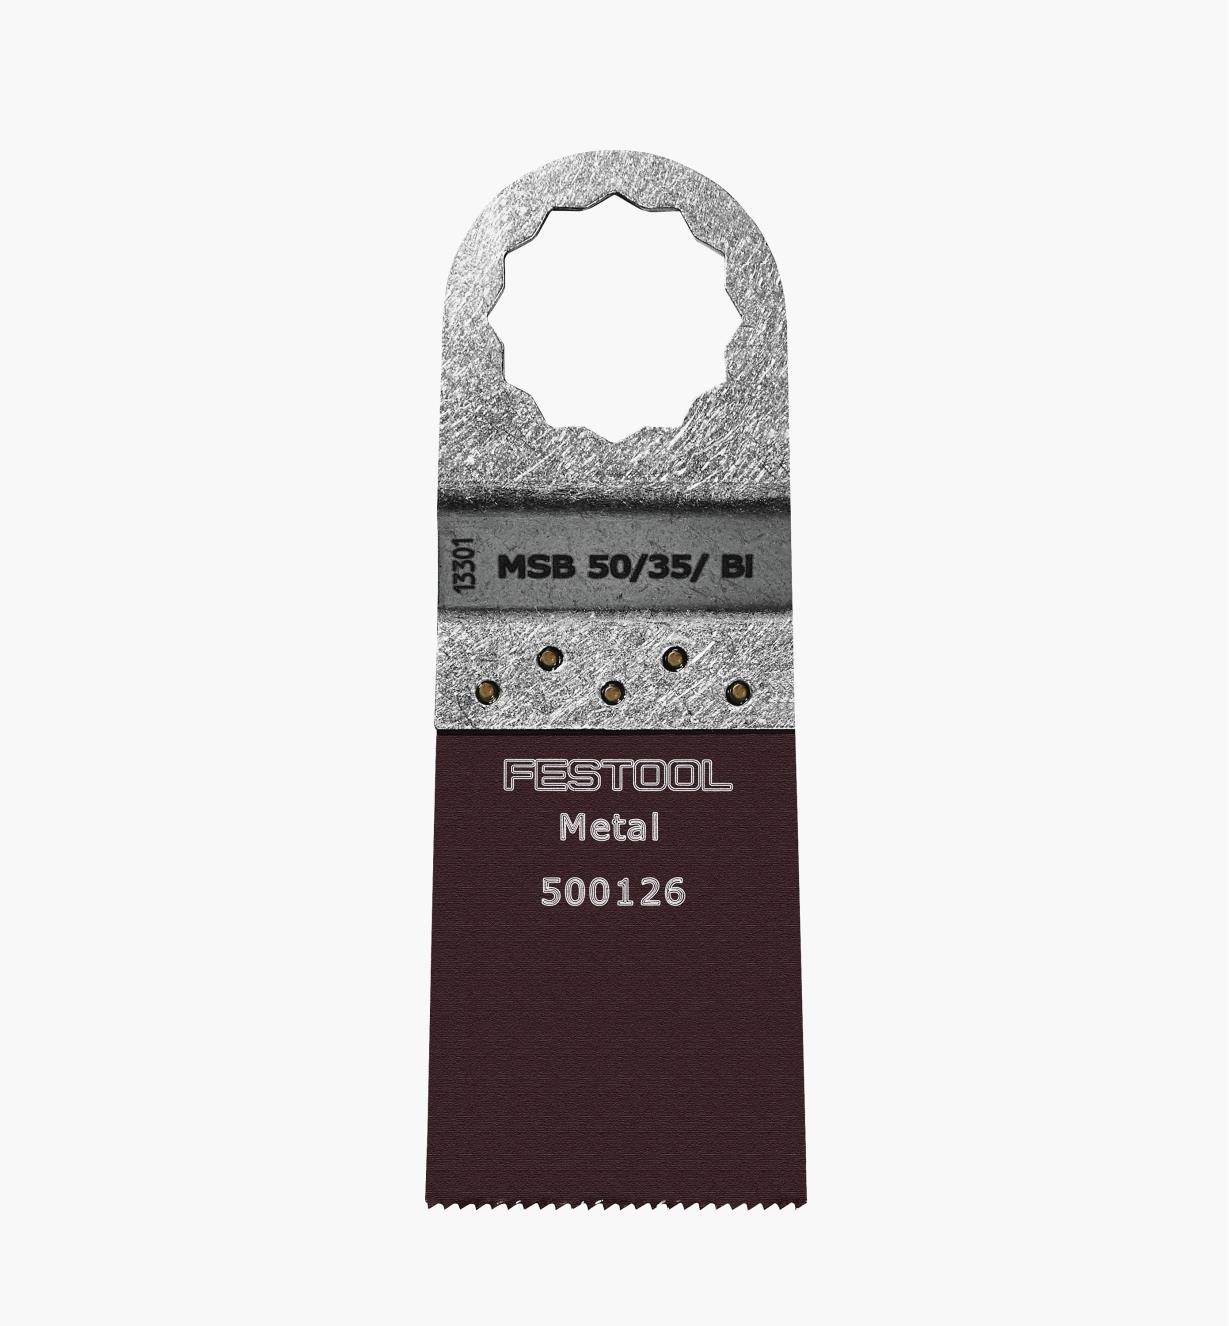 Bimetal Universal Blade MSB 50/35/Bi for Vecturo OS 400